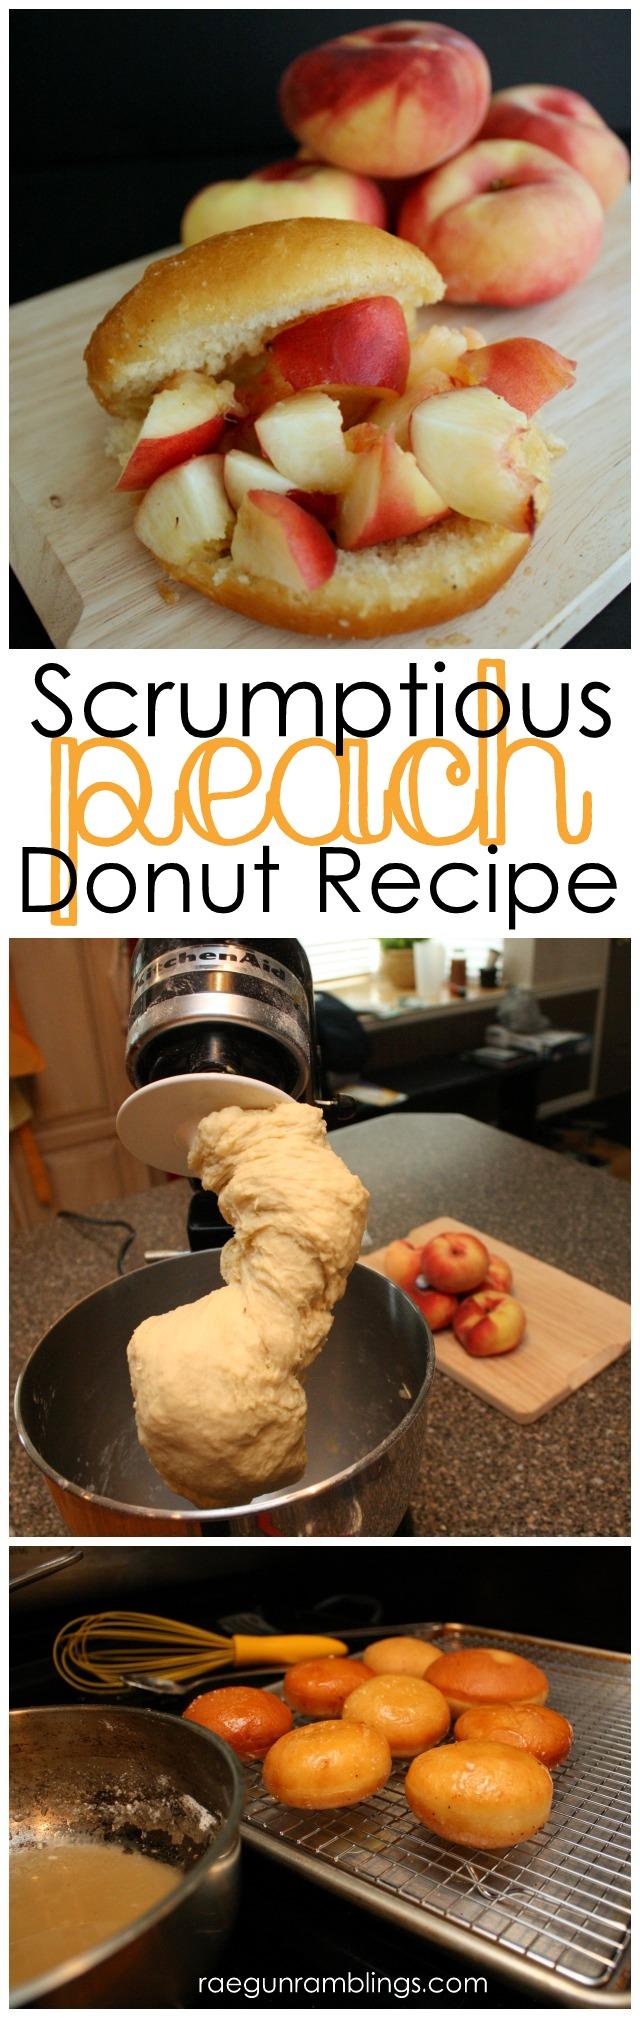 Great The Donut Man peach donut knock-off recipe. Super yummy at Rae Gun Ramblings